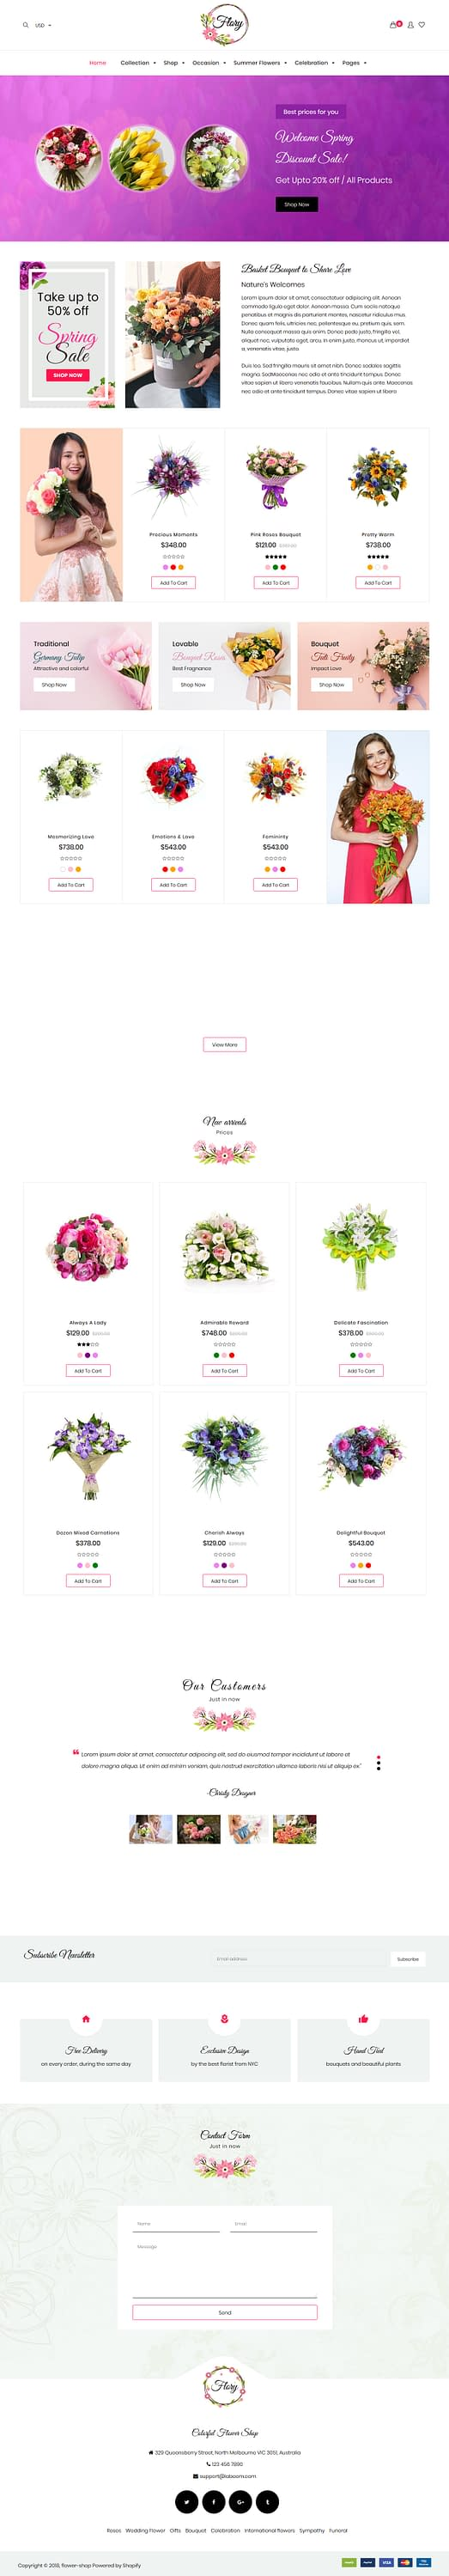 Flory – Best Premium Florist and Floriculture WordPress Theme